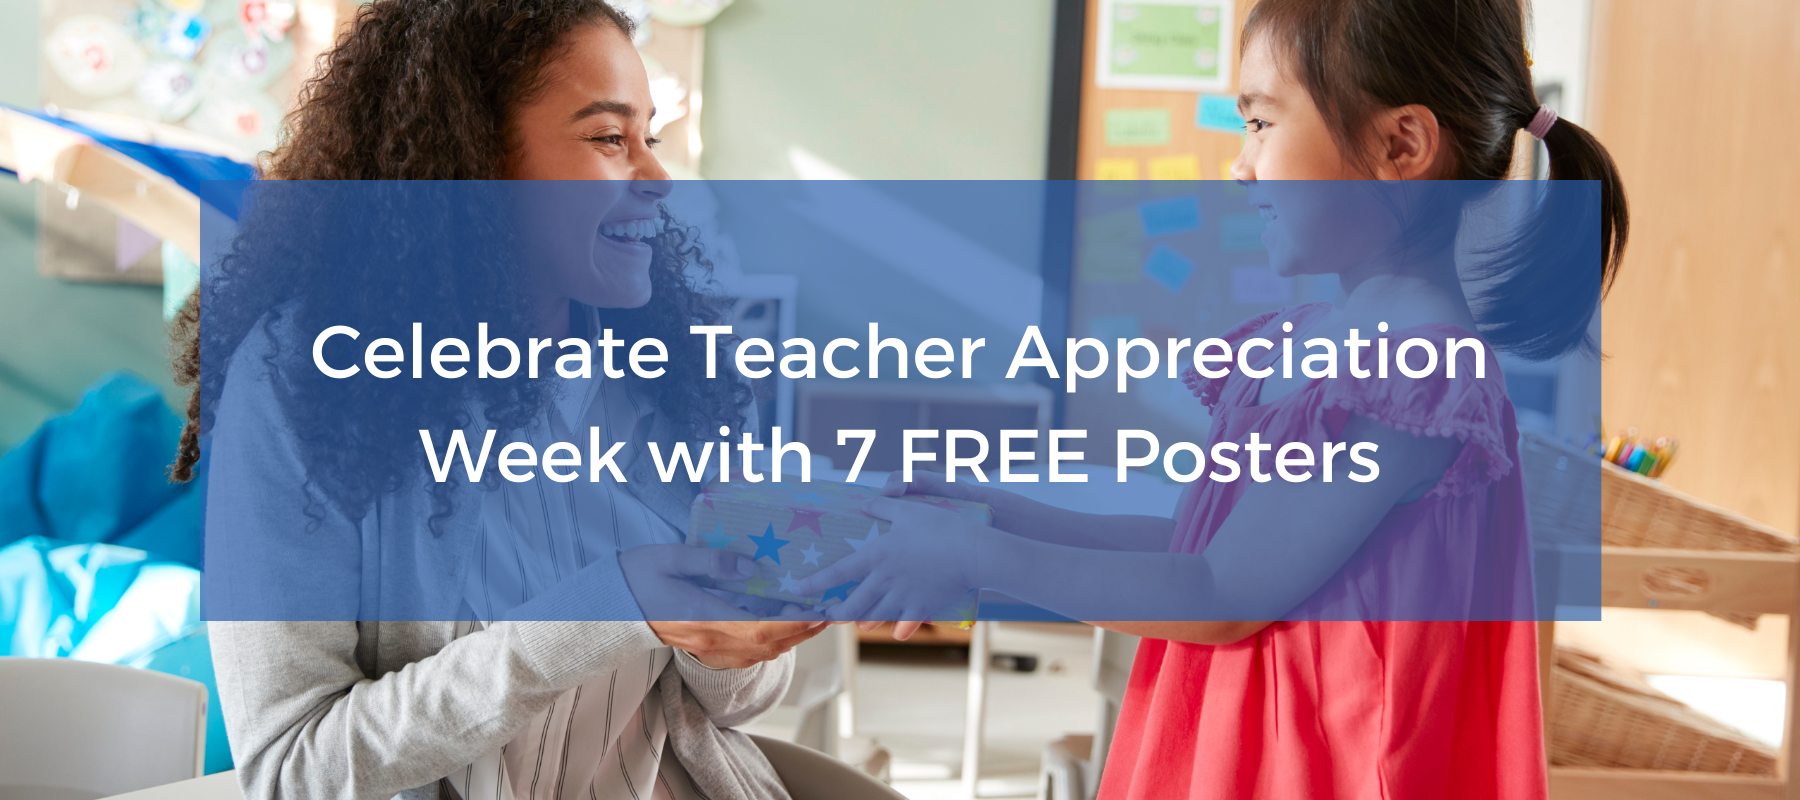 teacher appreciation week free posters